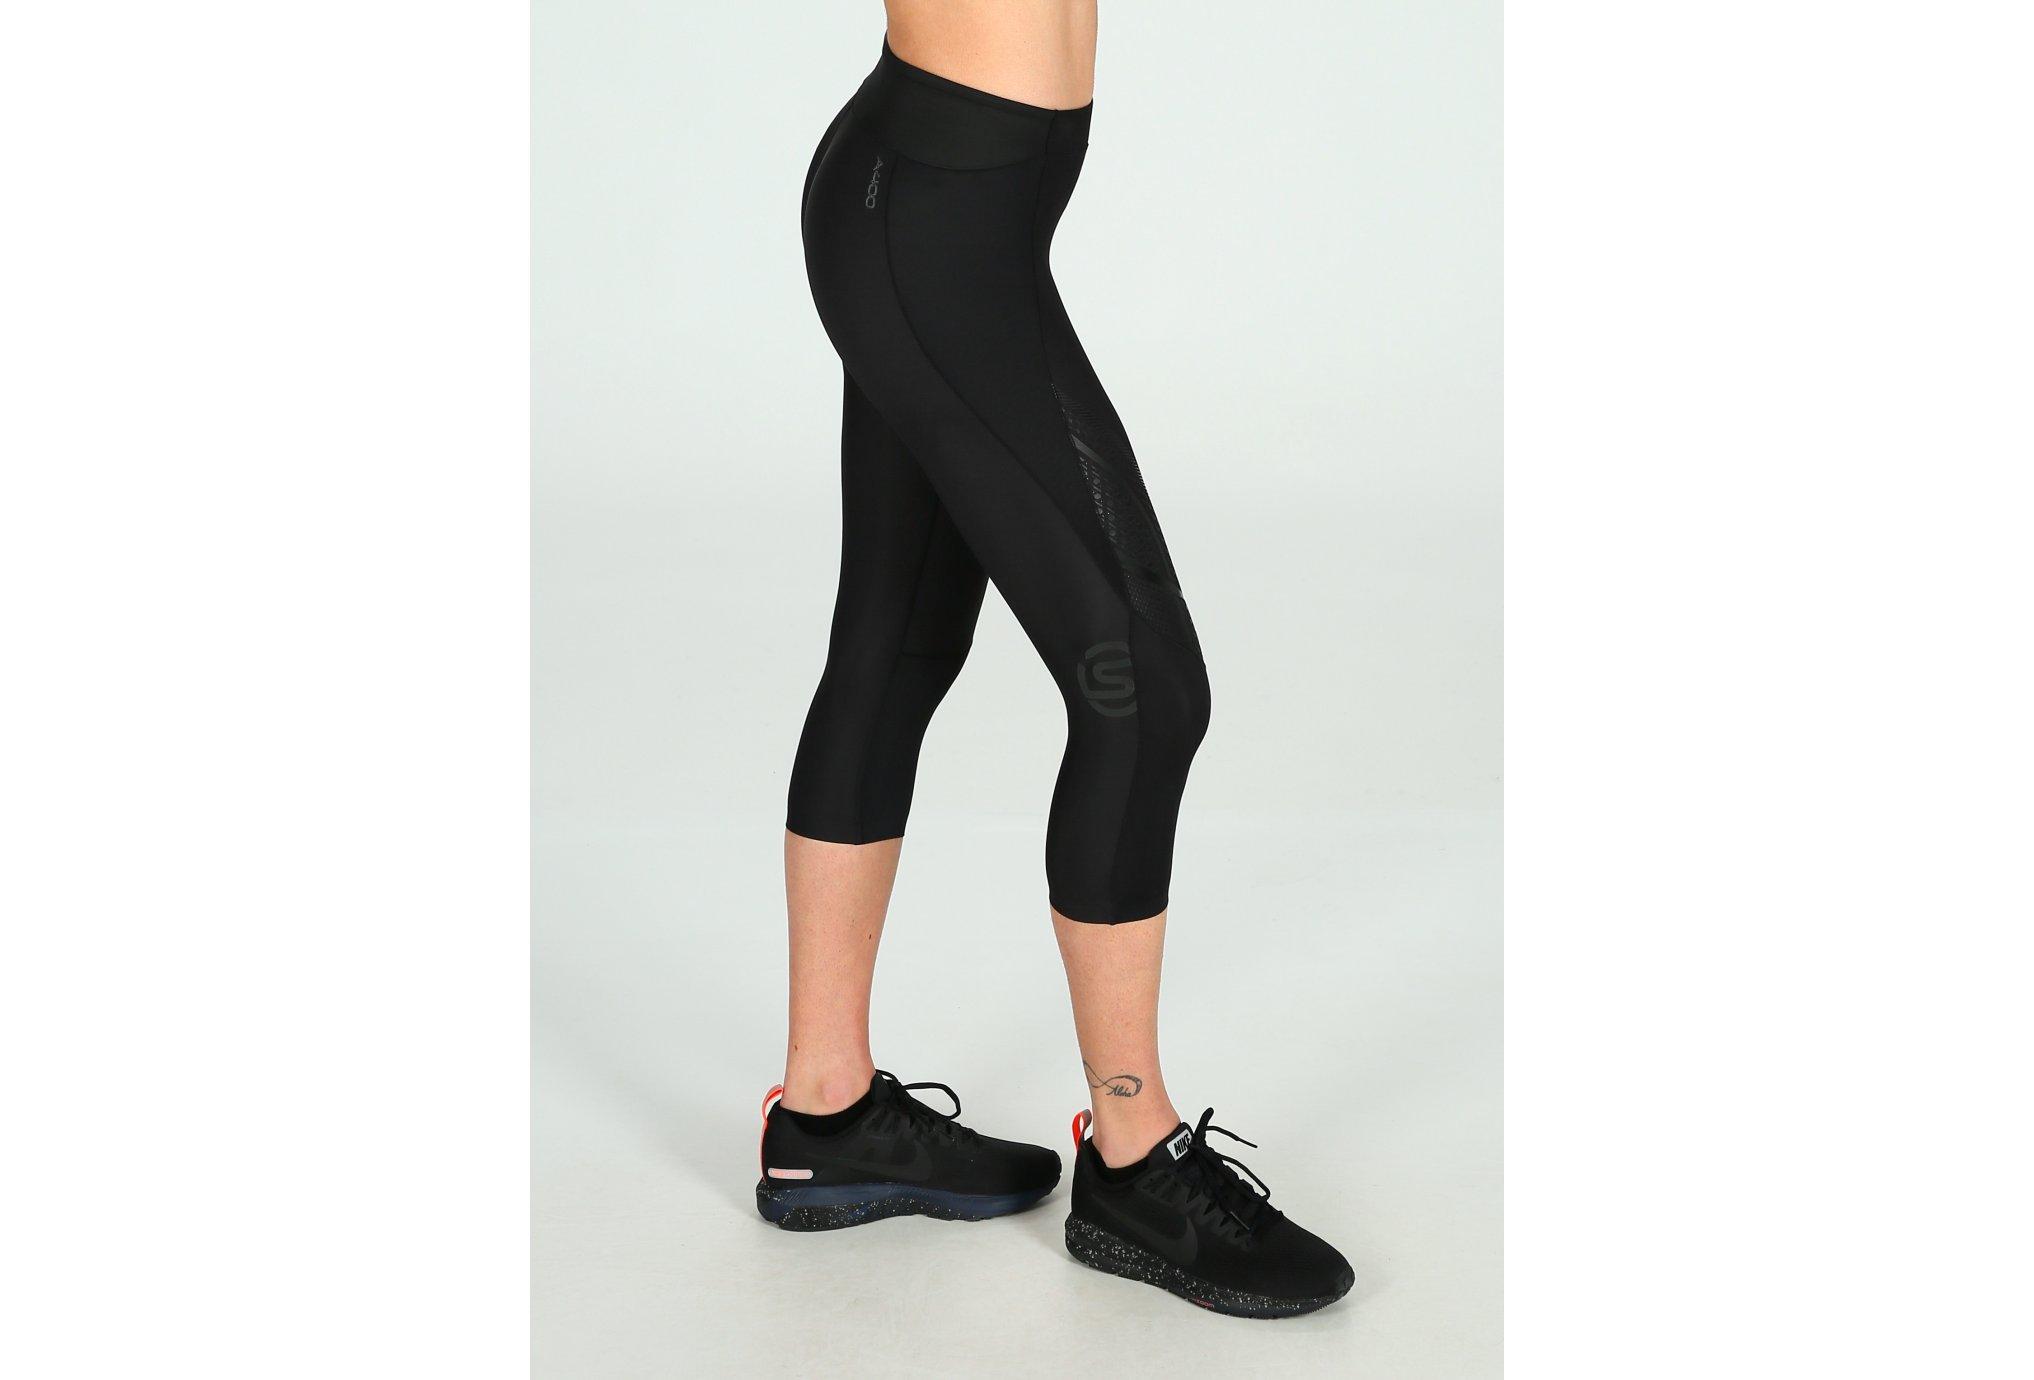 Skins Active 400 W vêtement running femme